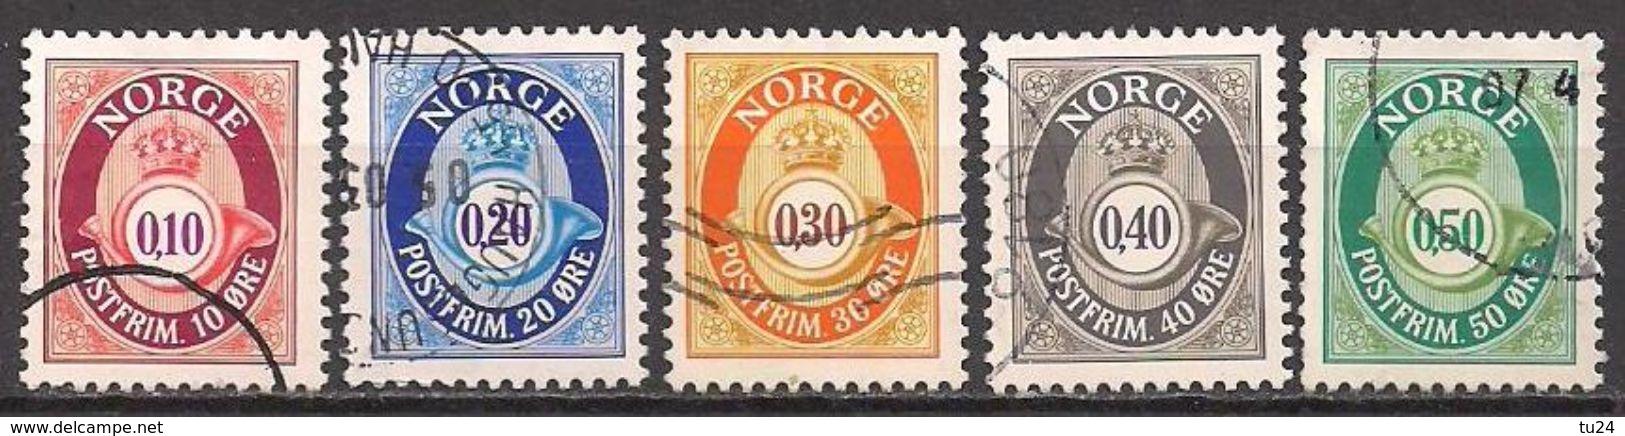 Norwegen  (1997)  Mi.Nr.  1237 - 1241 A  Gest. / Used  (3ev19) - Norwegen